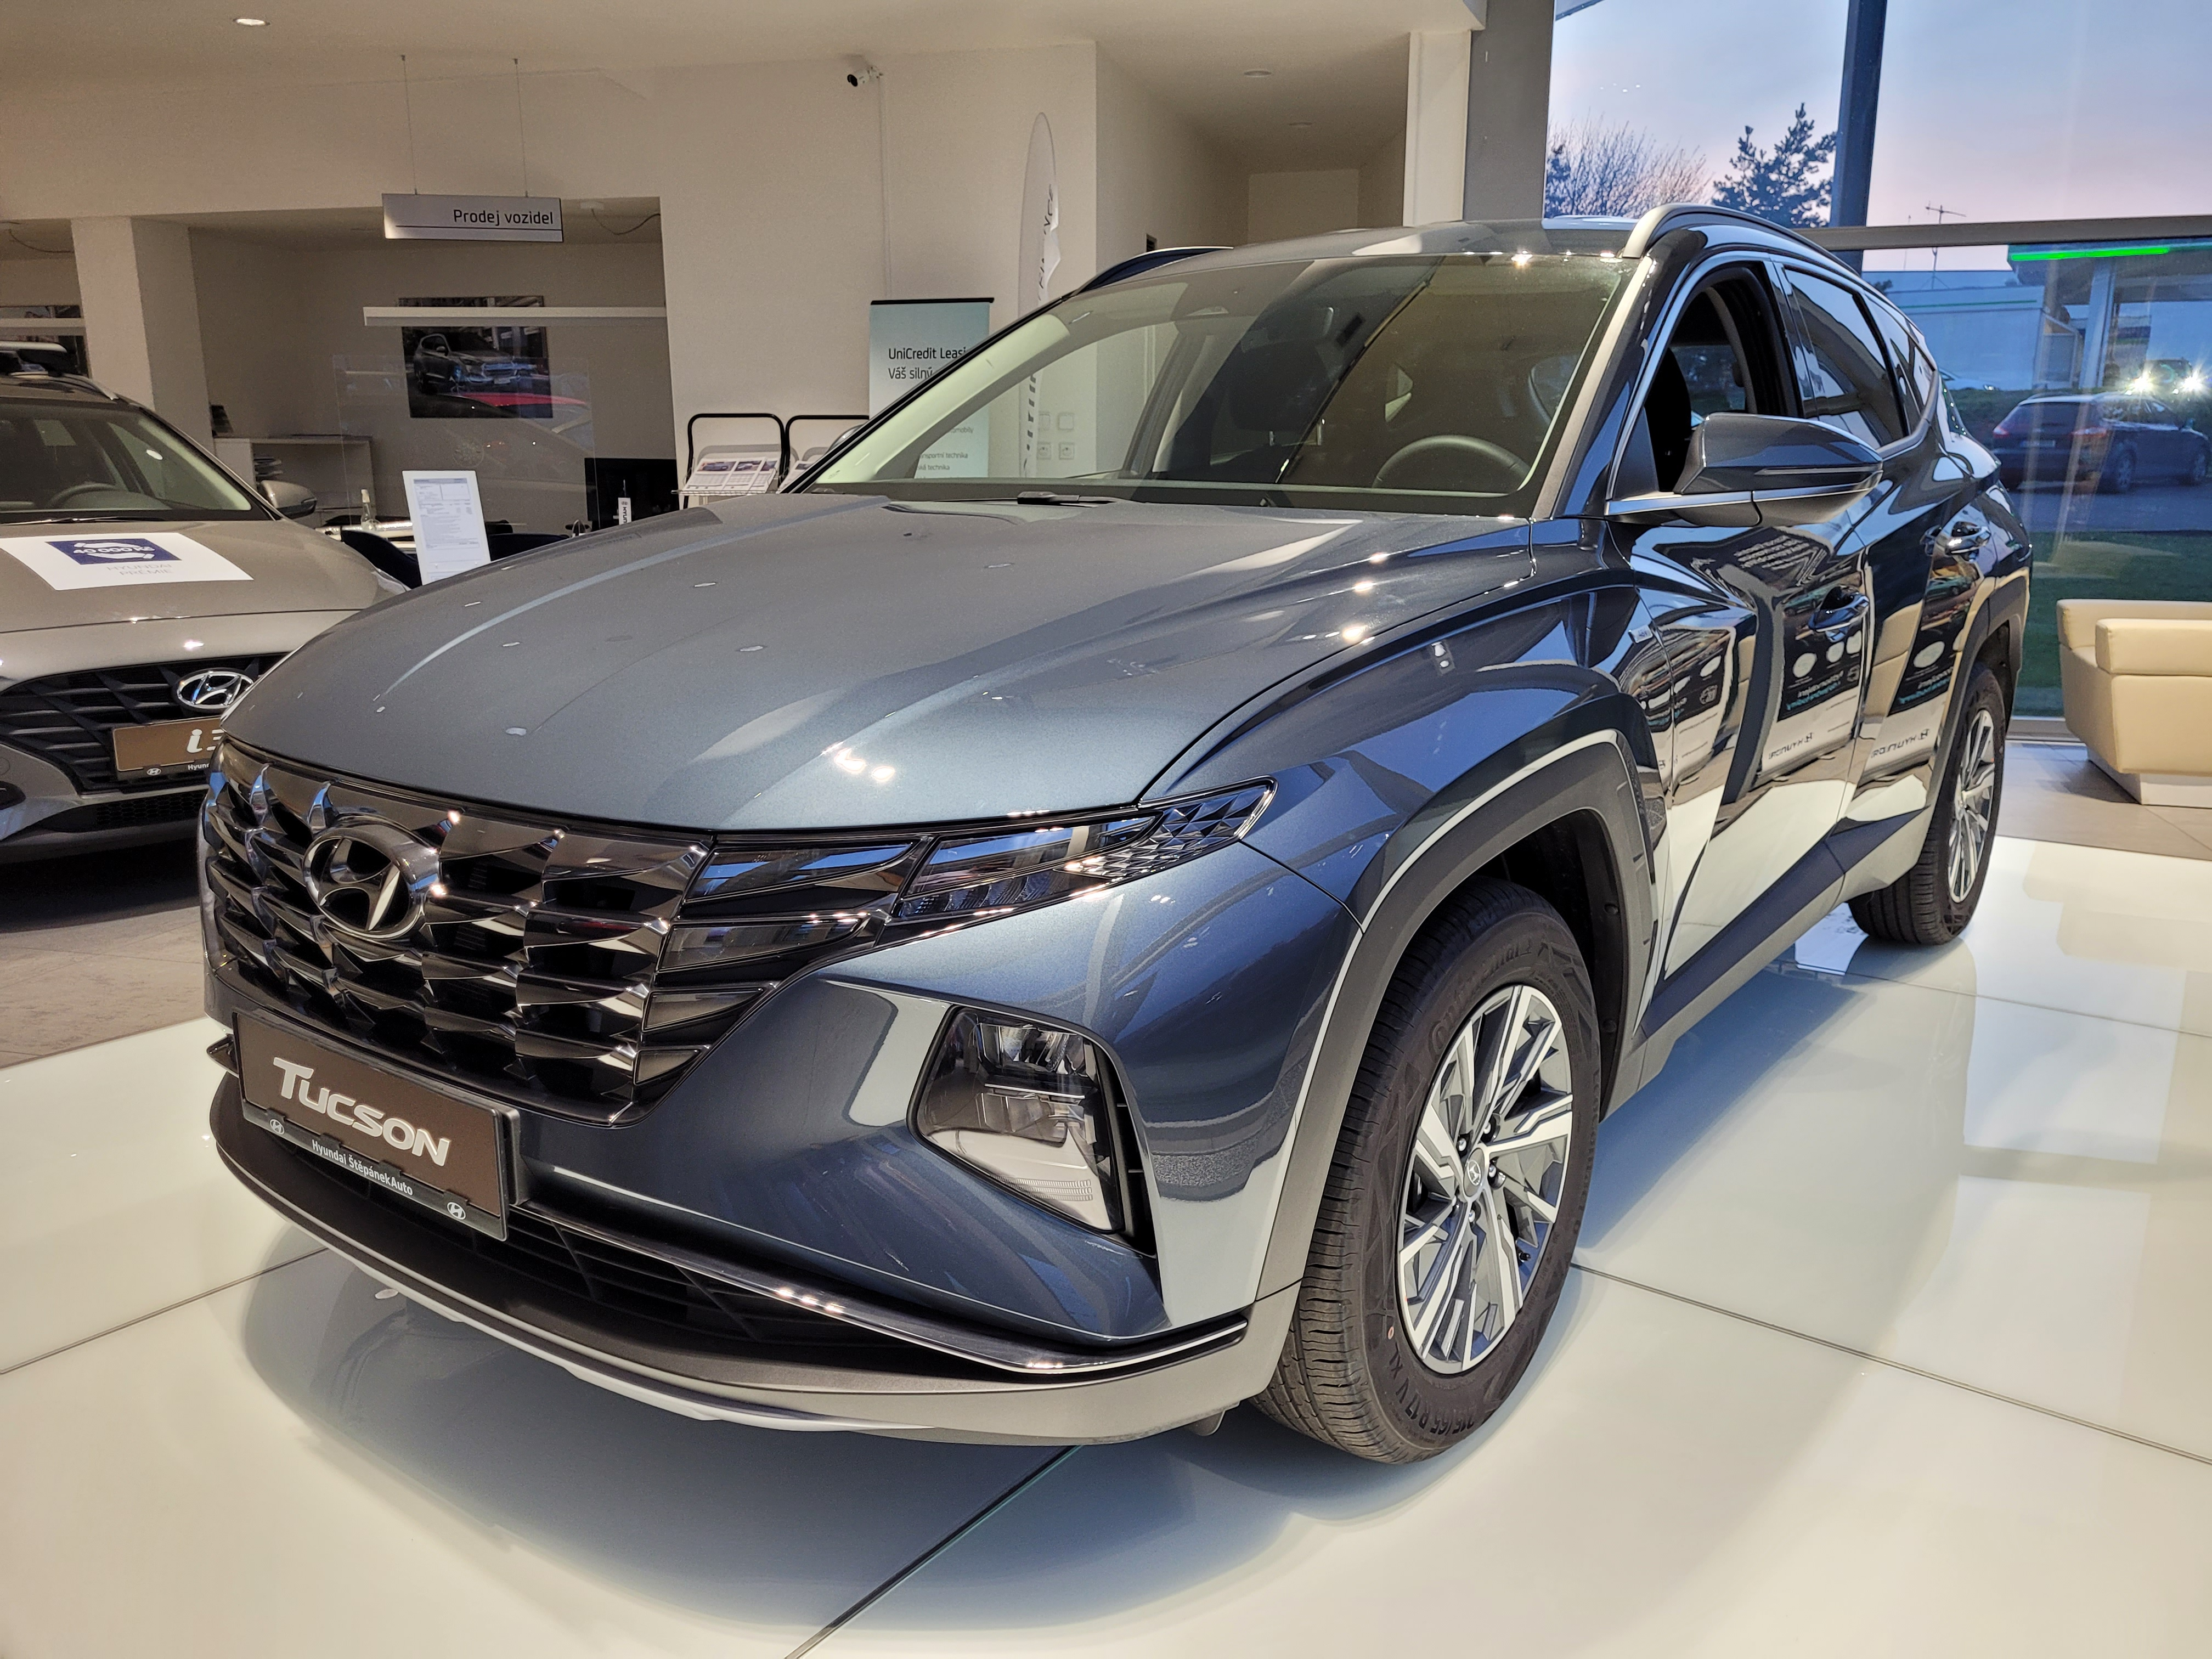 Hyundai Tucson 1.6 T-GDi Smart Navi